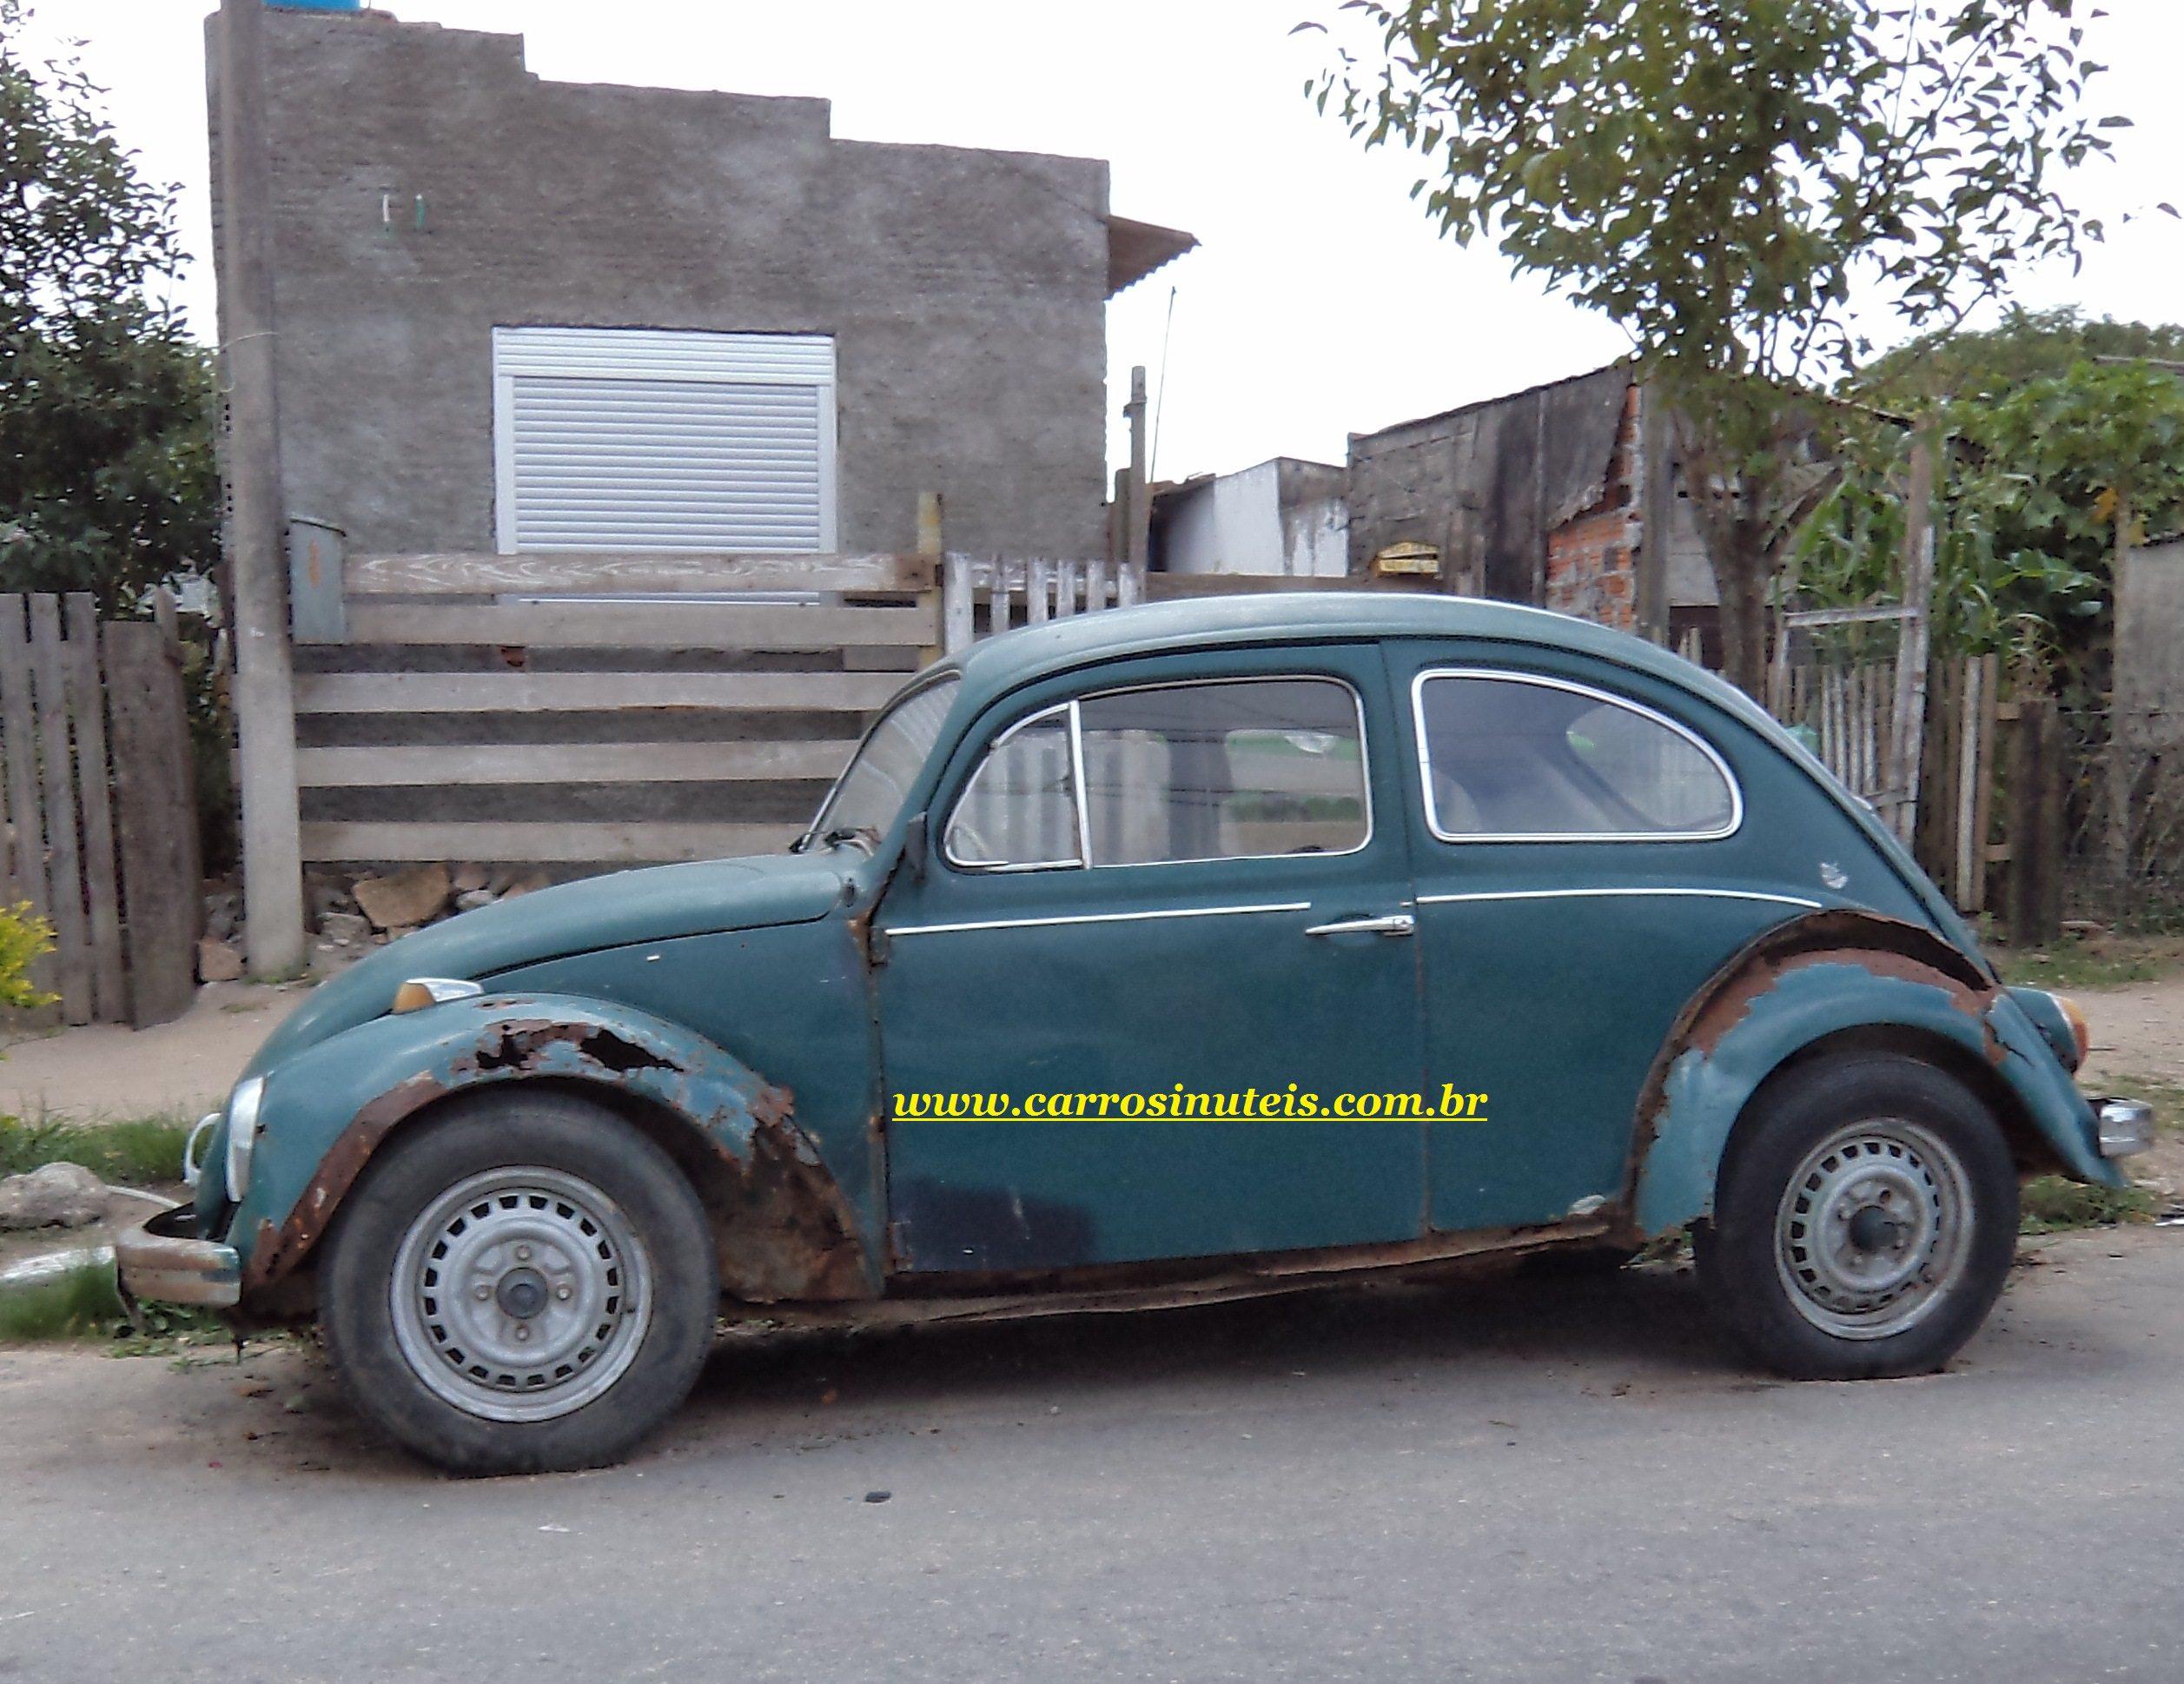 Tiago Pelotas RS Fusca - Carros Inúteis